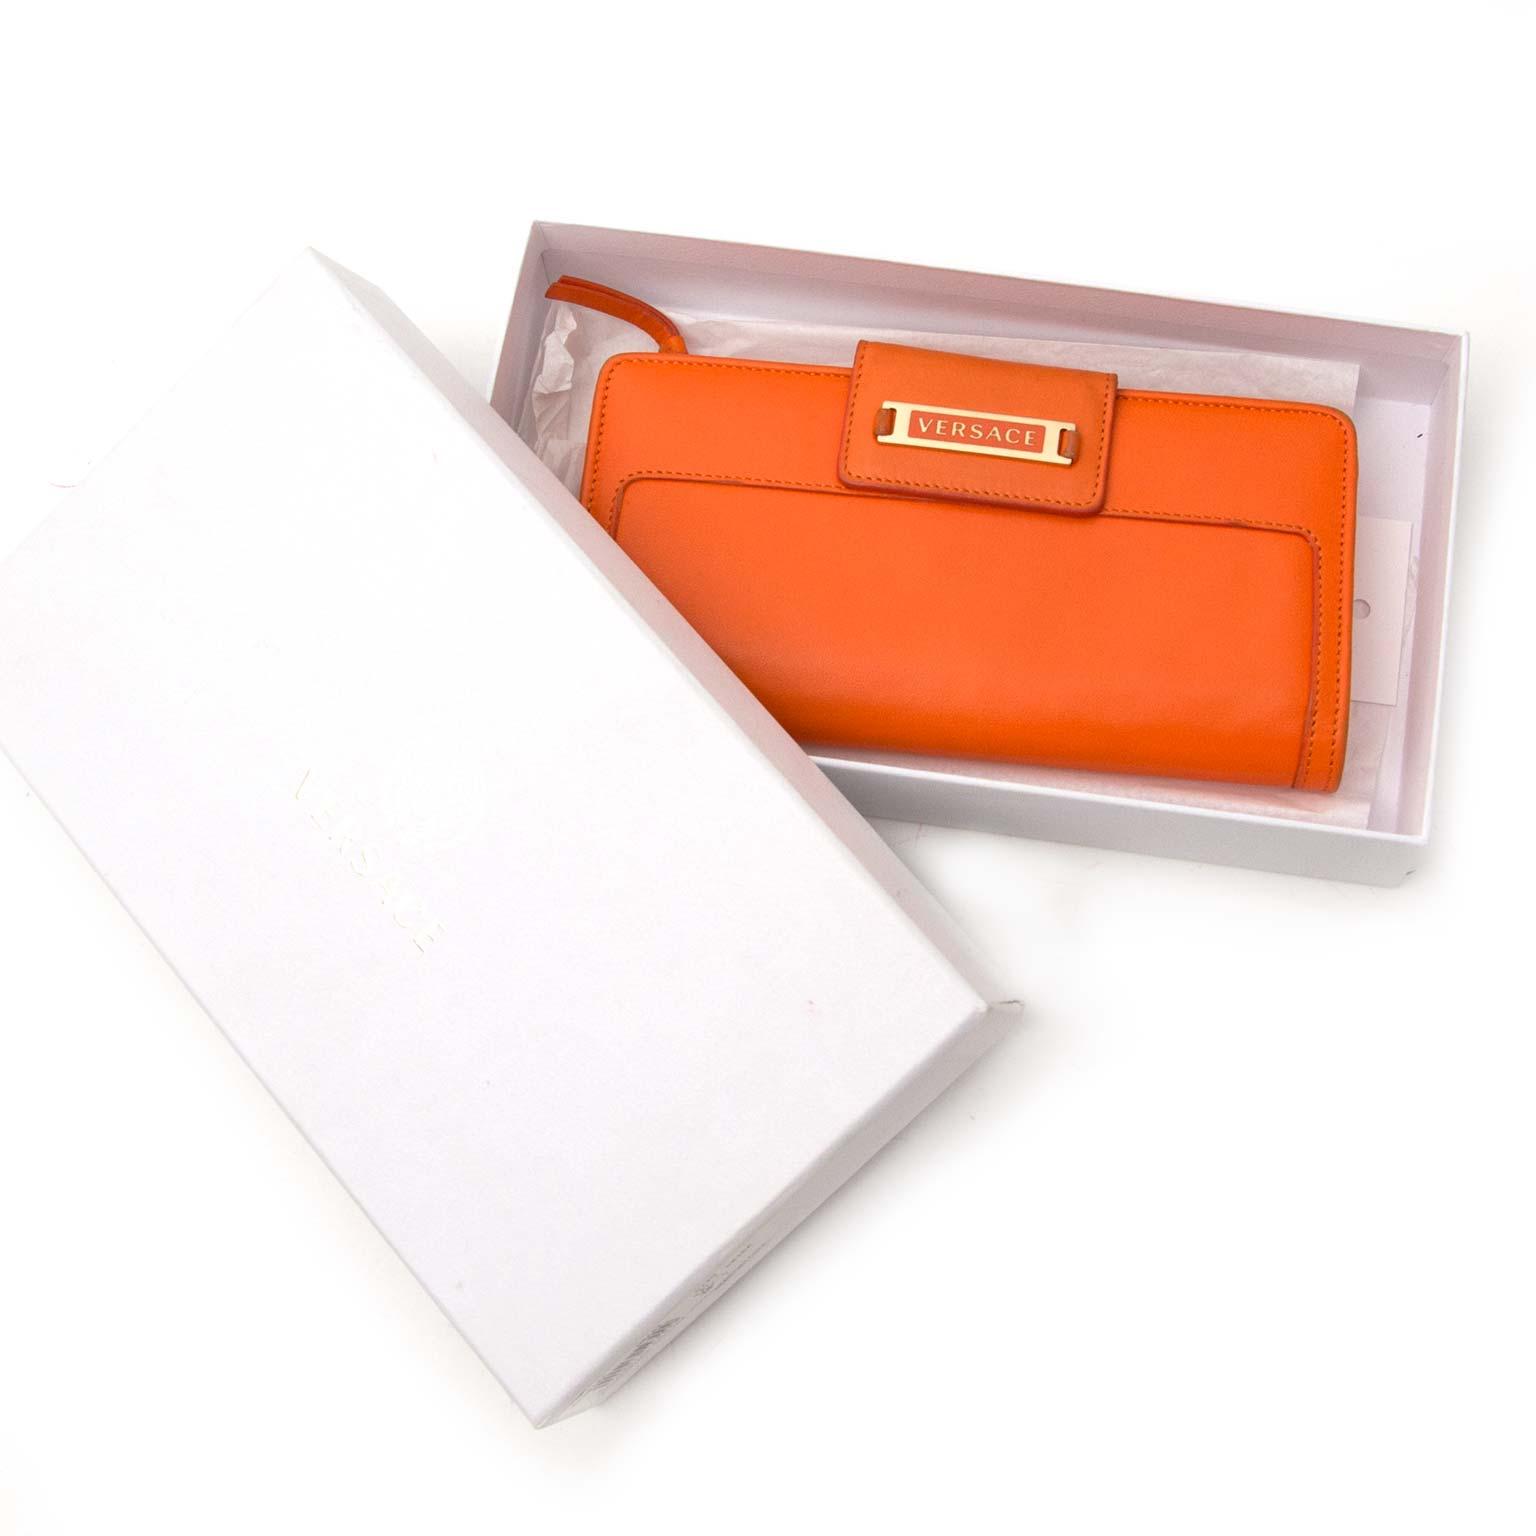 acheter en ligne secone main Versace Orange Lambskin Wallet